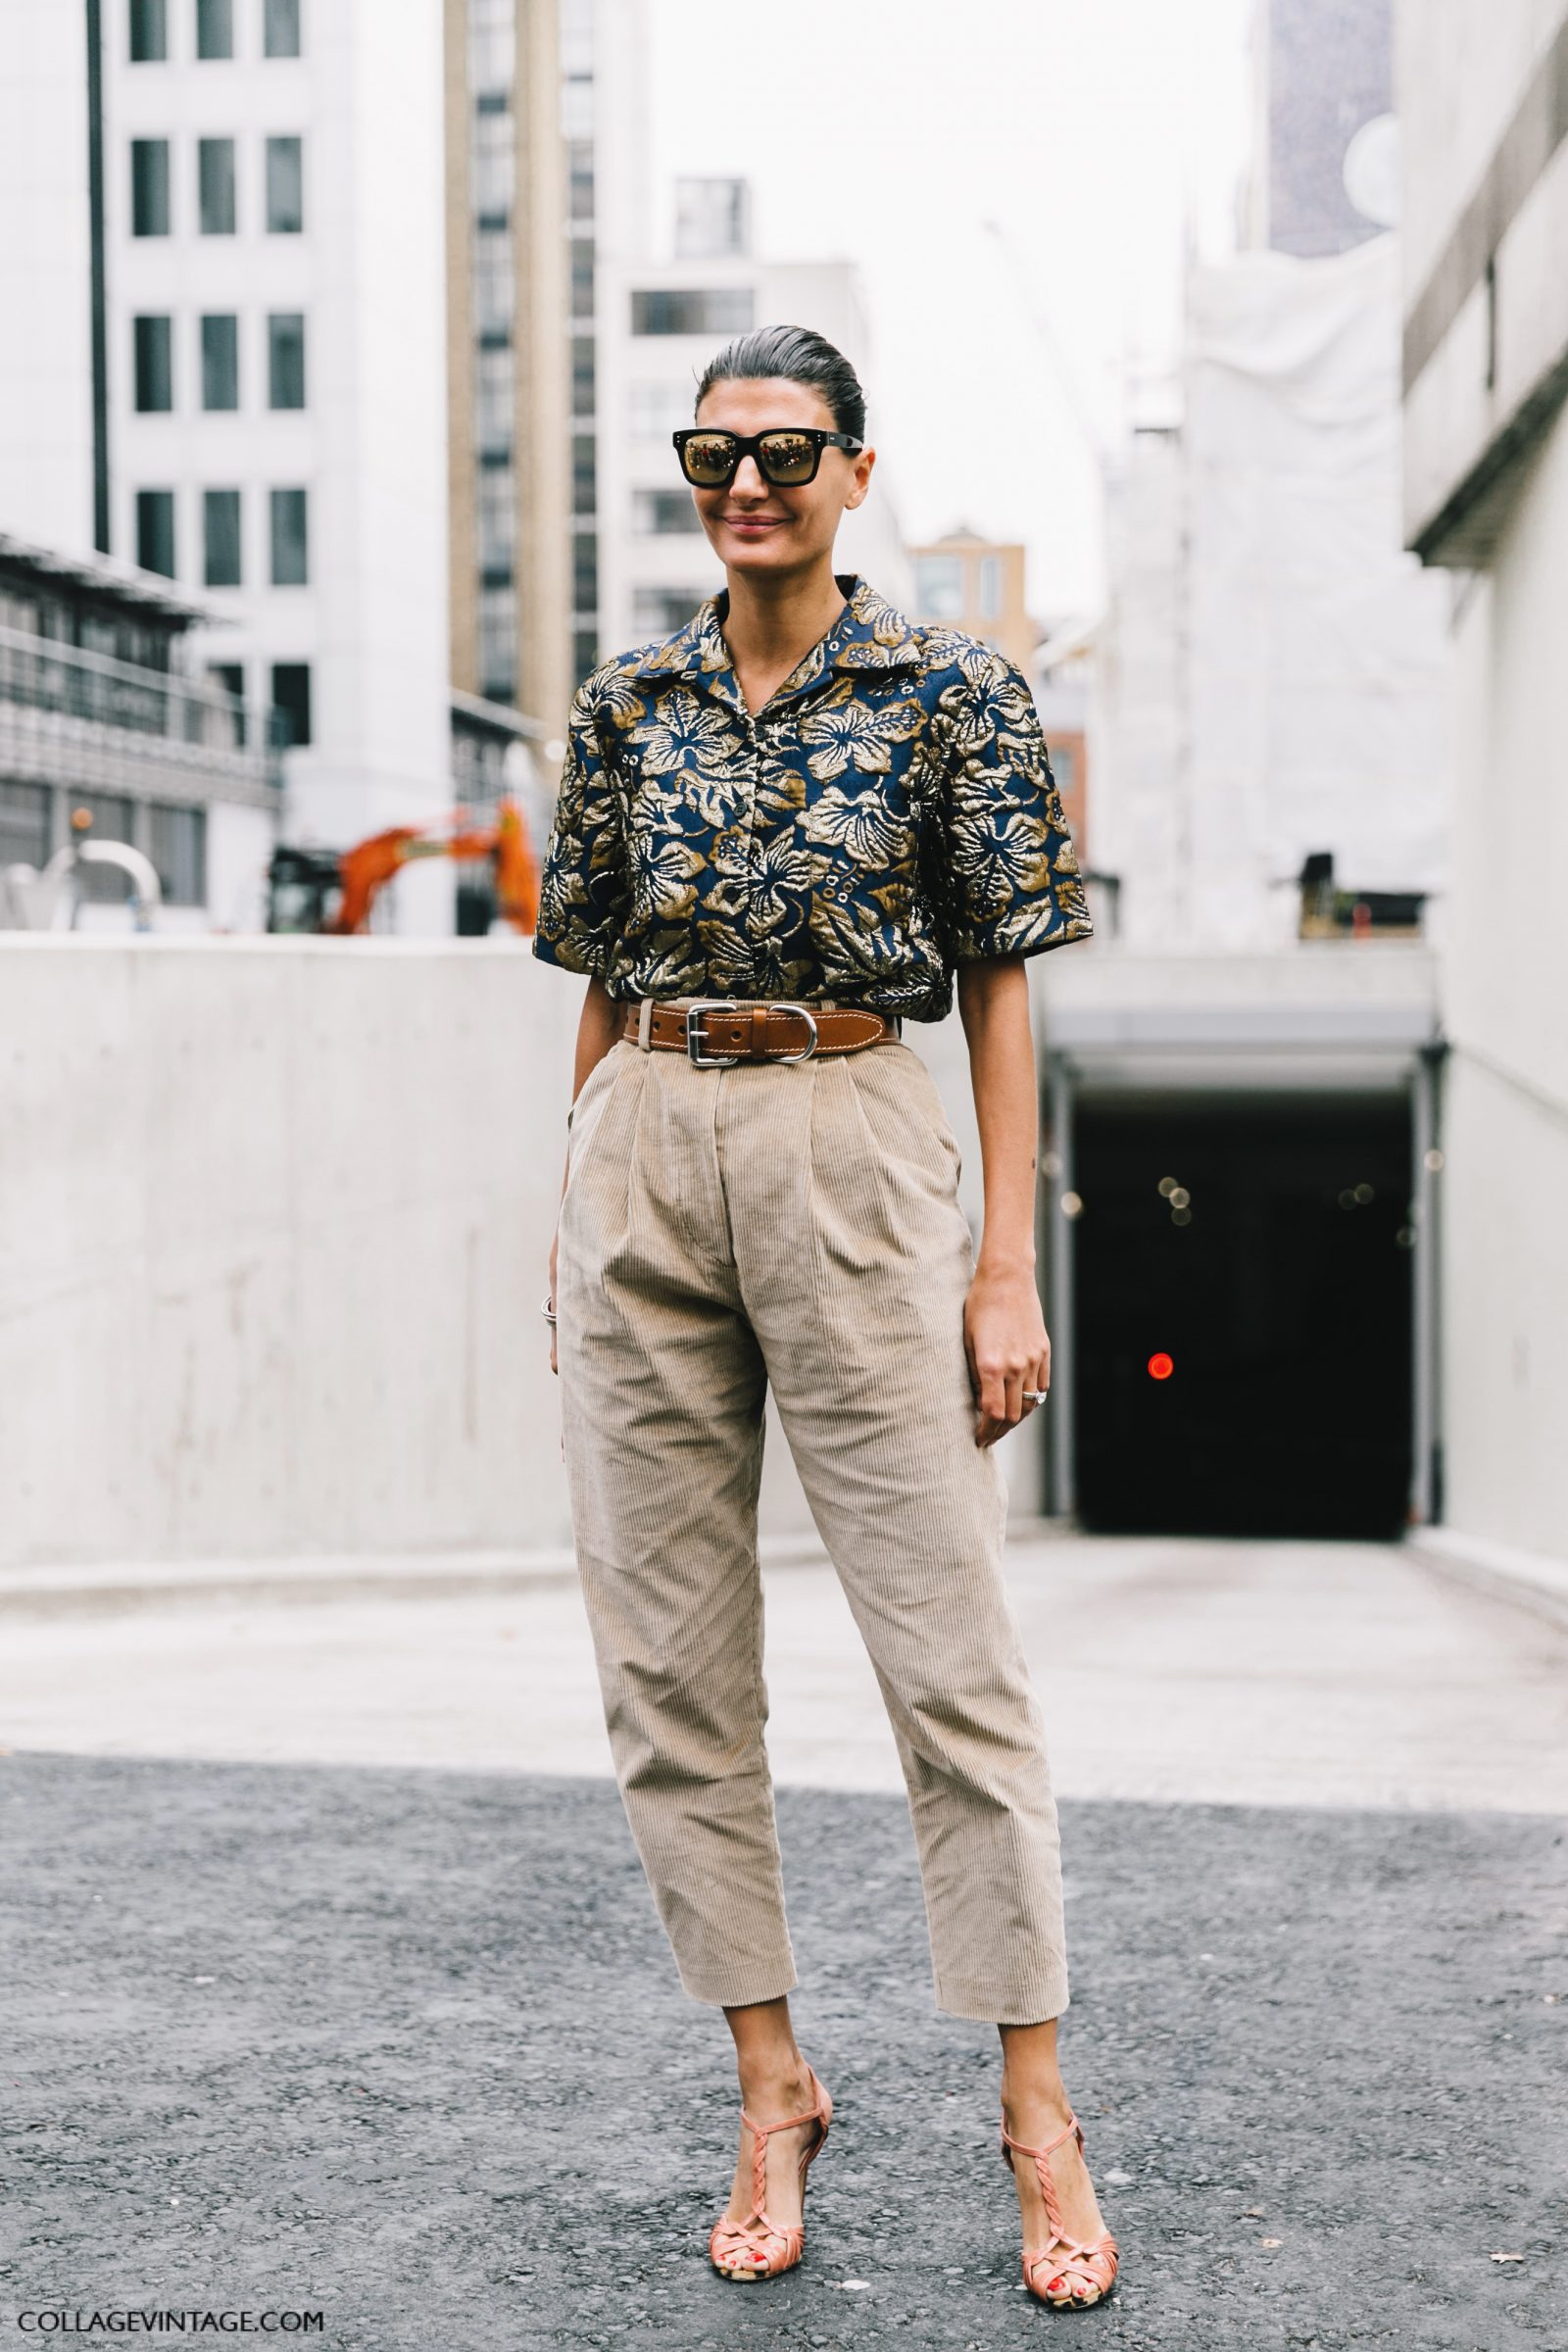 lfw-london_fashion_week_ss17-street_style-outfits-collage_vintage-vintage-roksanda-christopher_kane-joseph-17